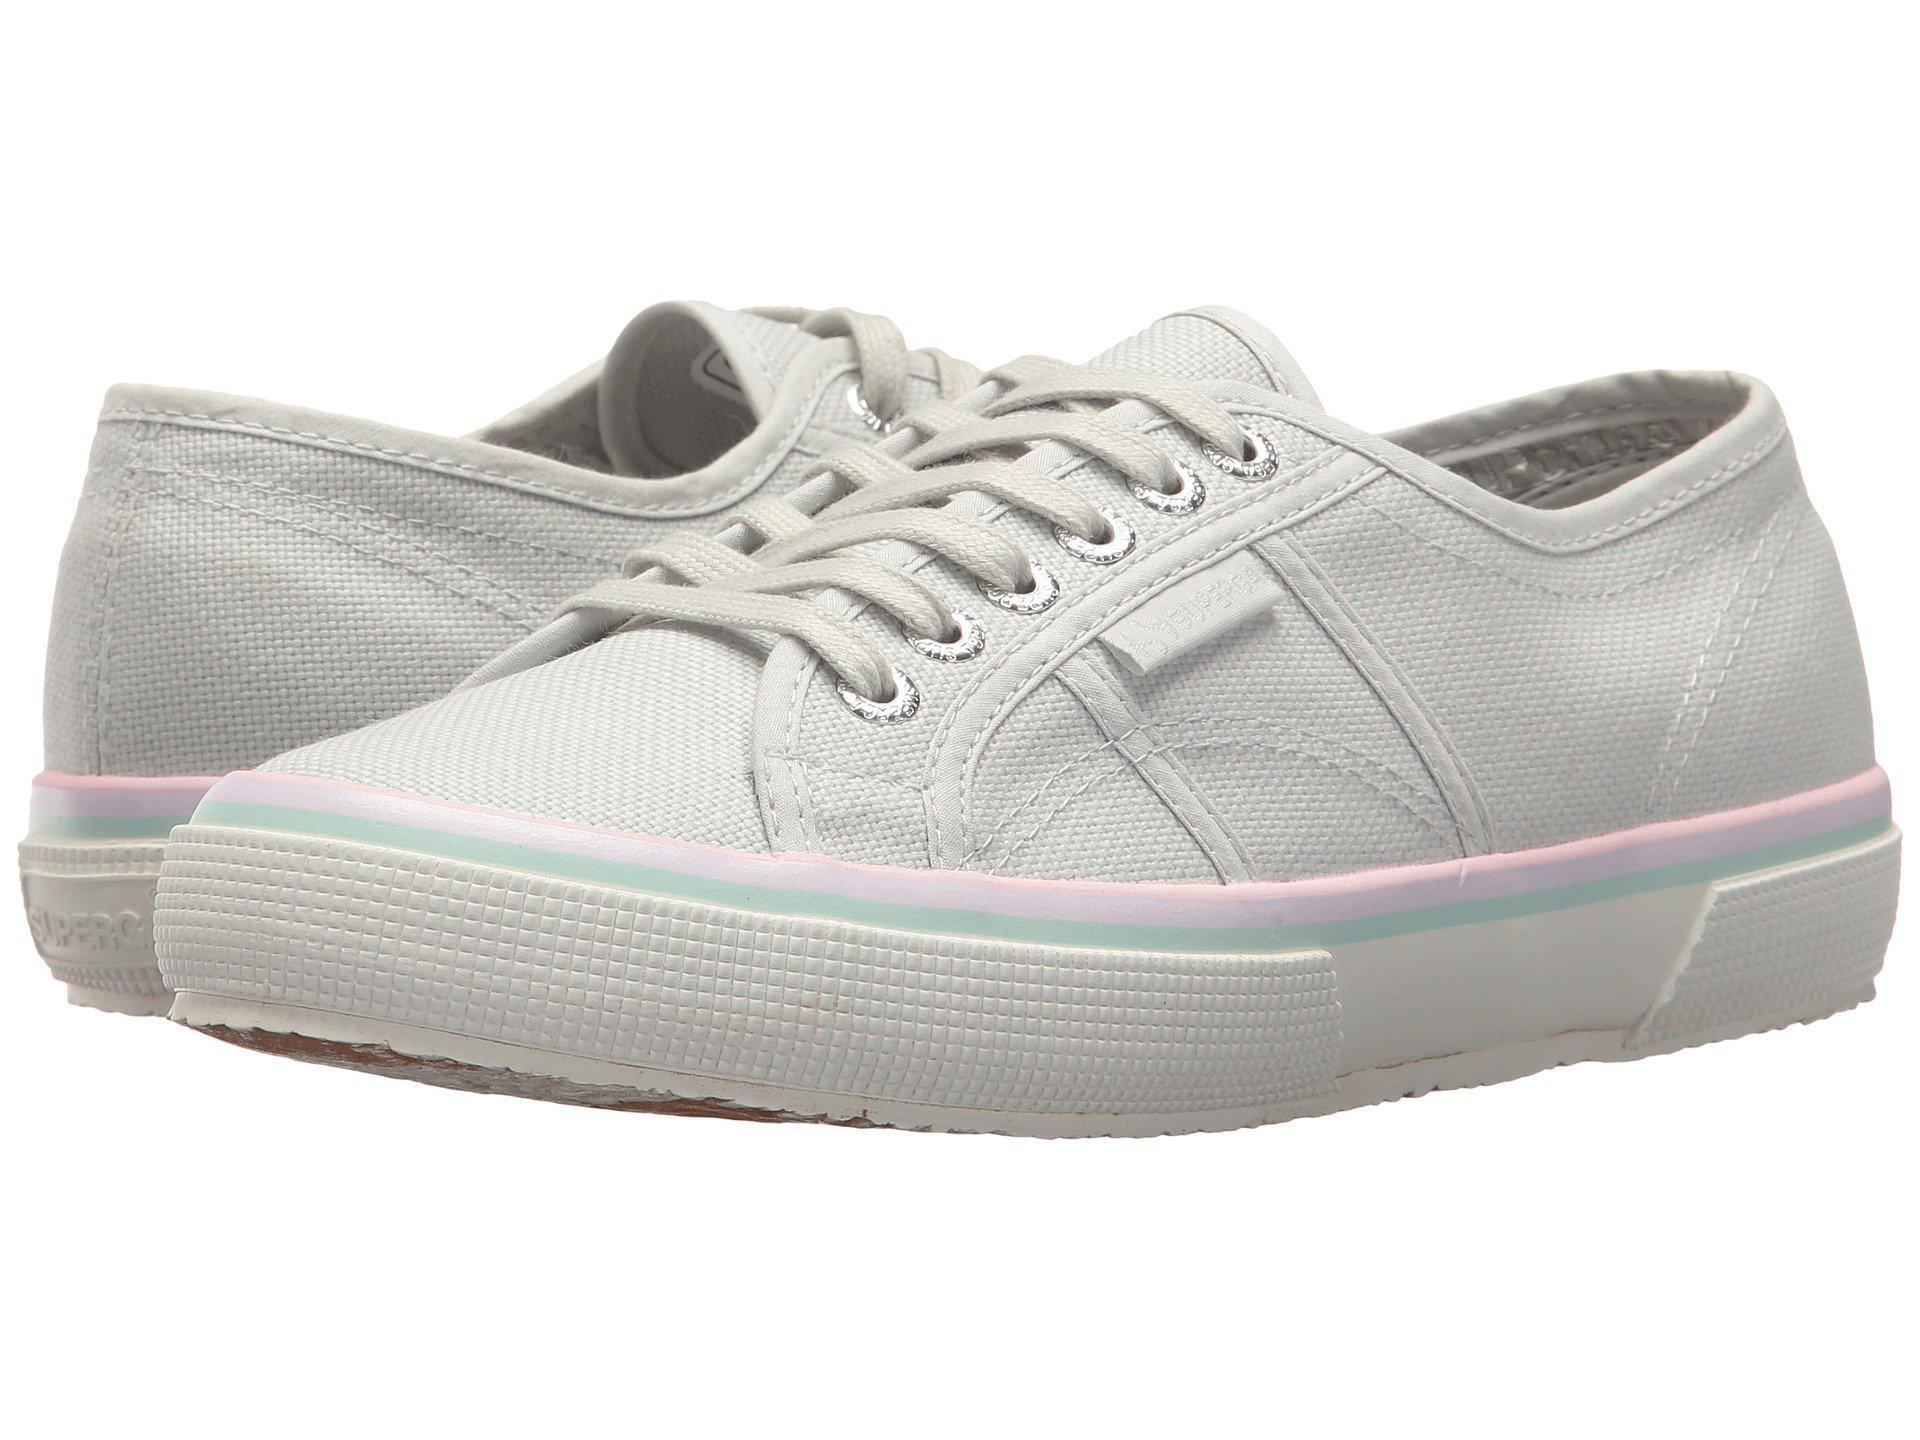 96c8d282166 Lyst - Superga 2750 Cotw3stripe Sneaker - Save 38%